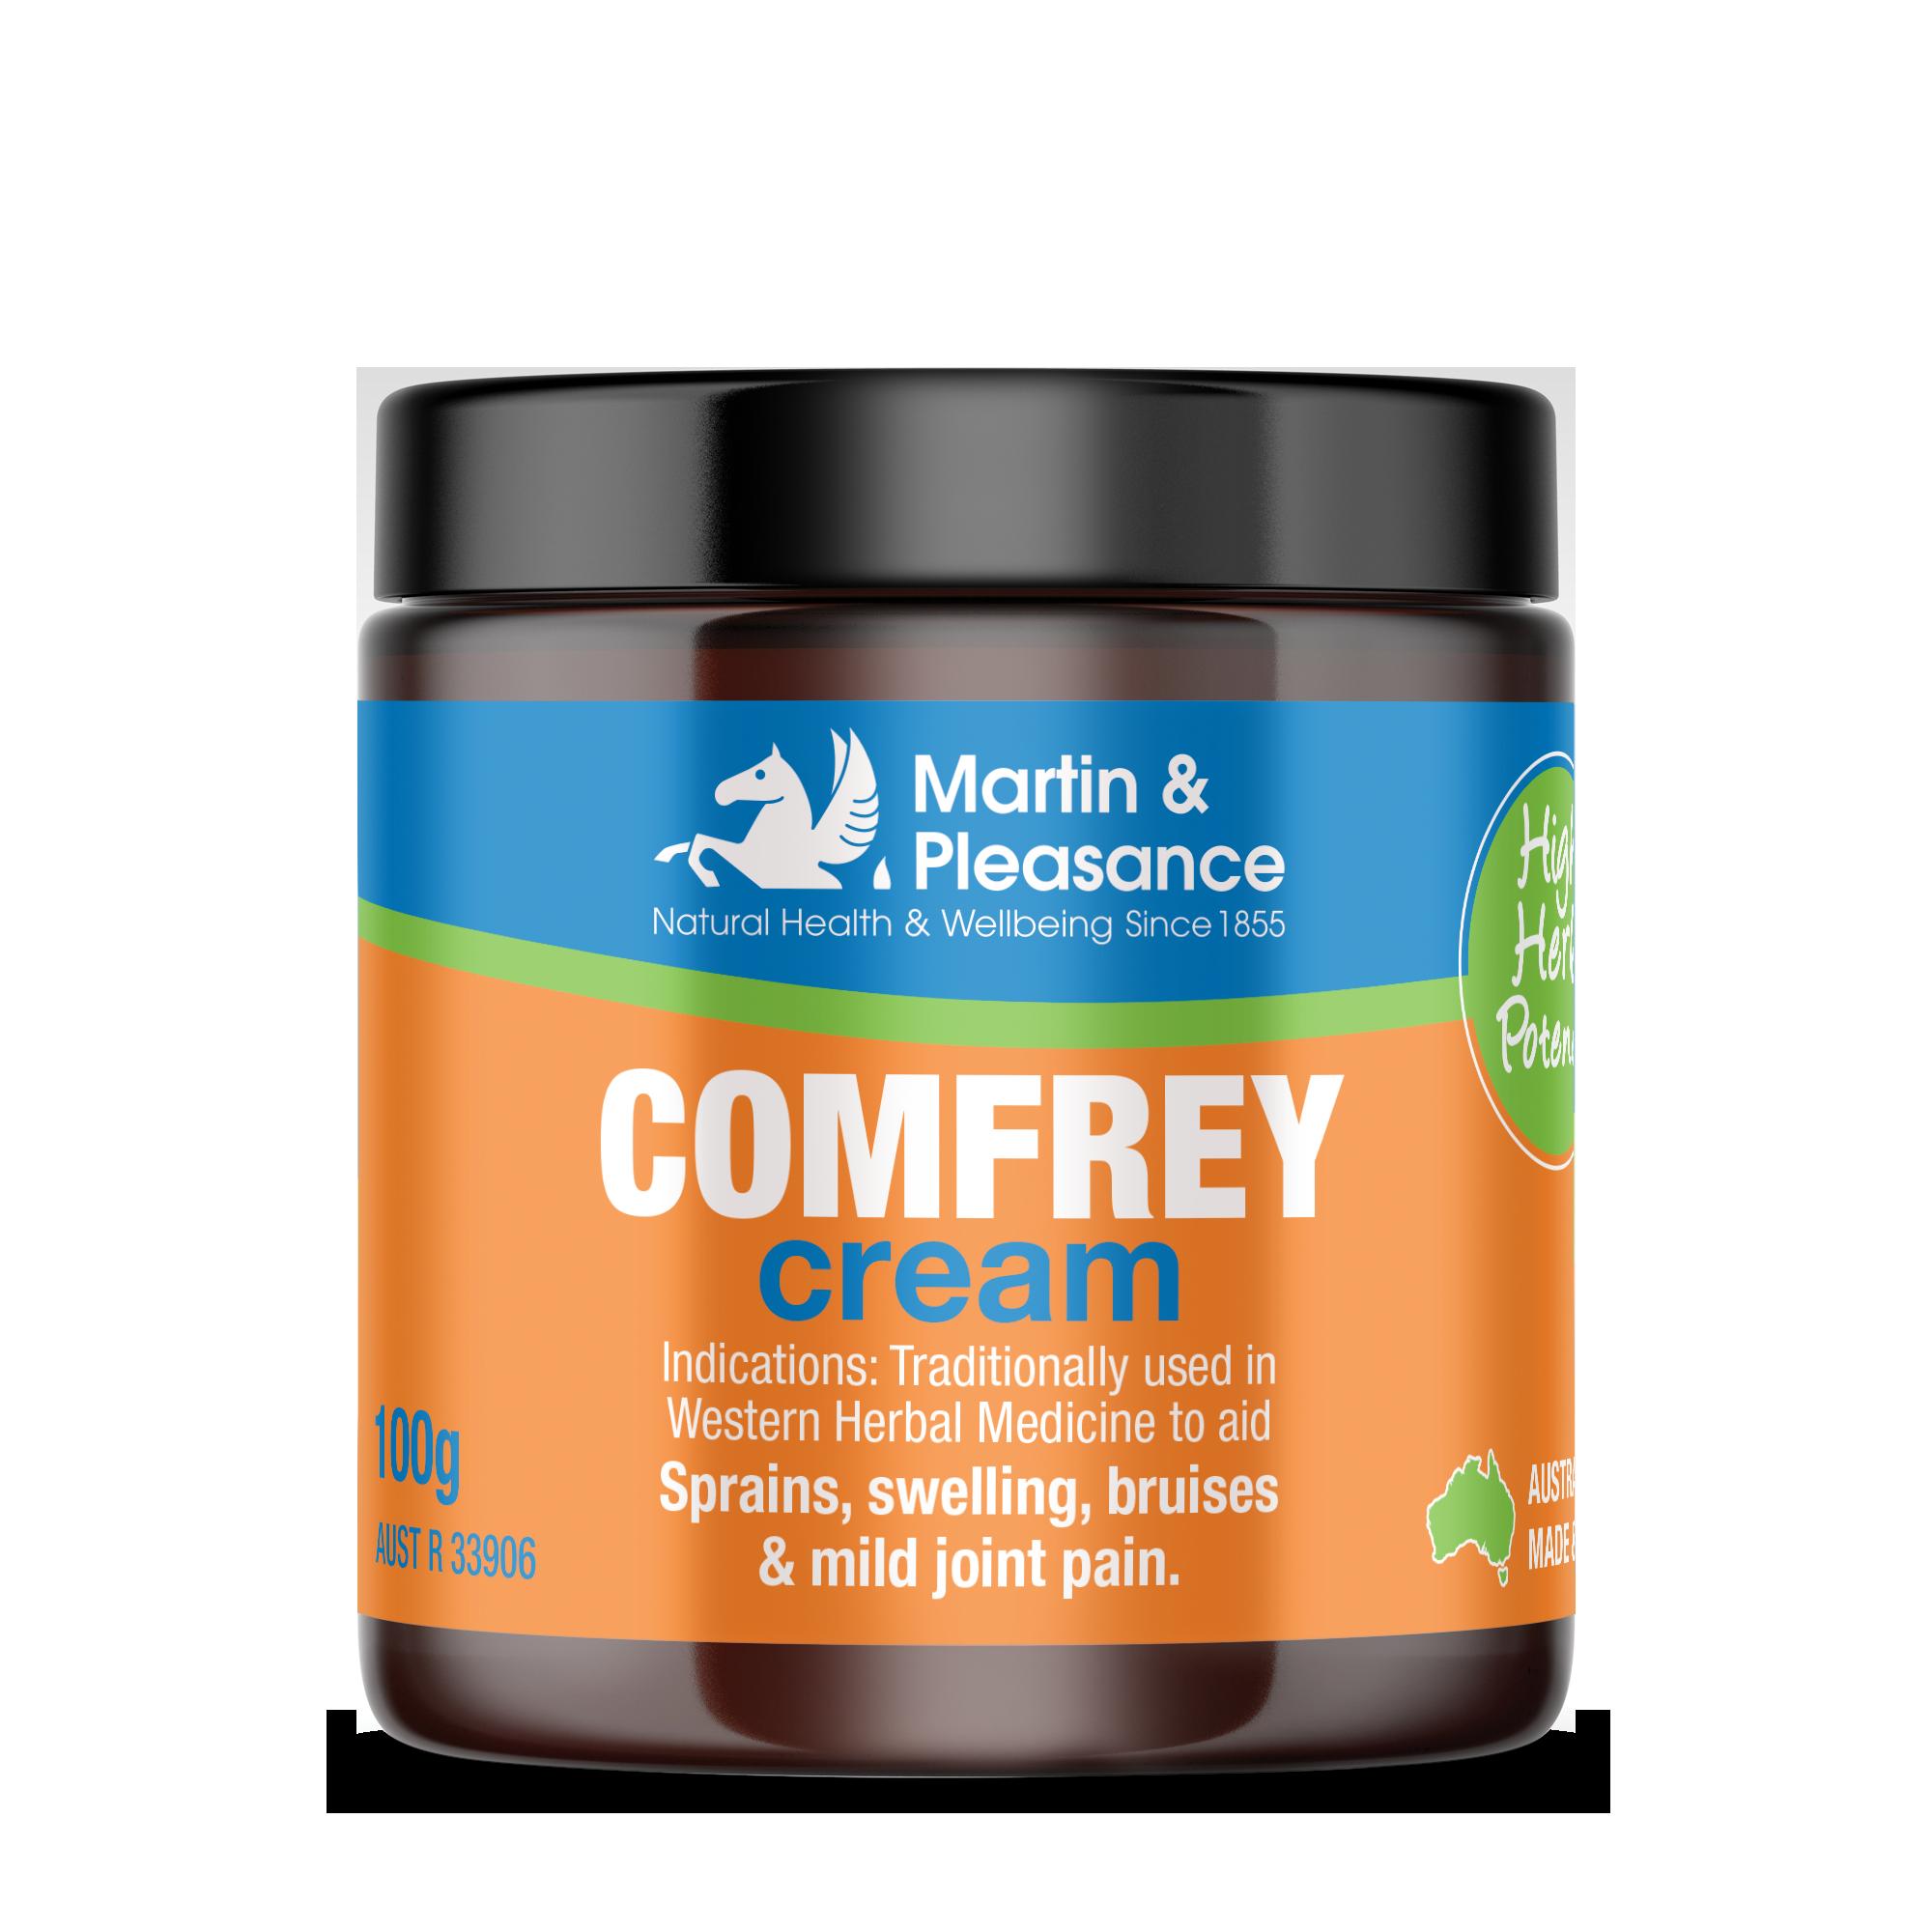 Martin & Pleasance Comfrey Cream 100g